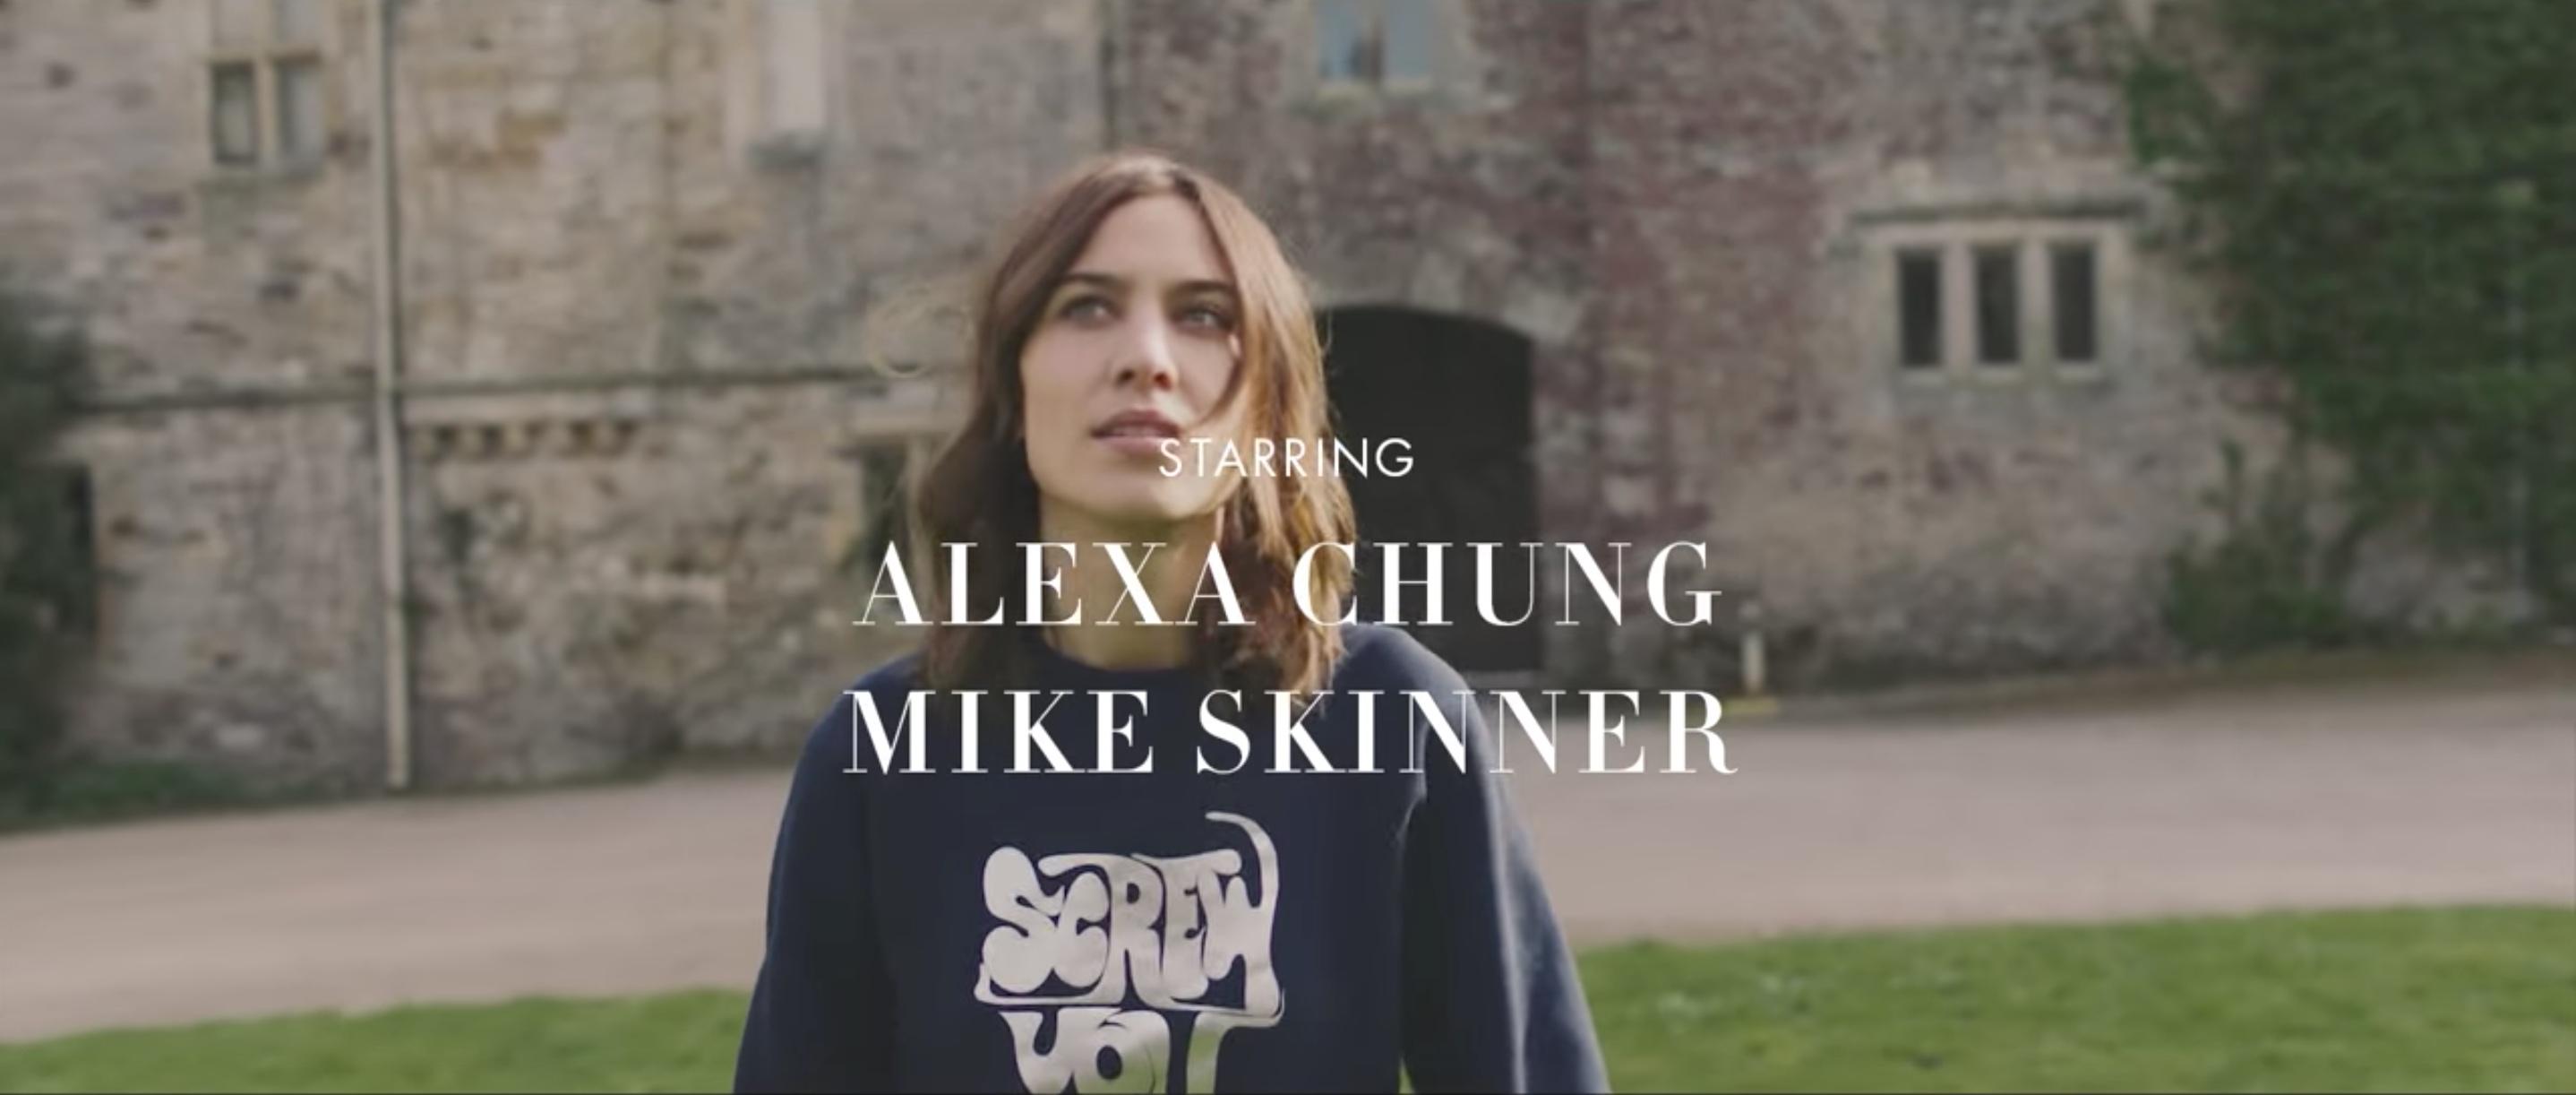 Alexachung: Mike Skinner (The Streets) X Alexa Chung